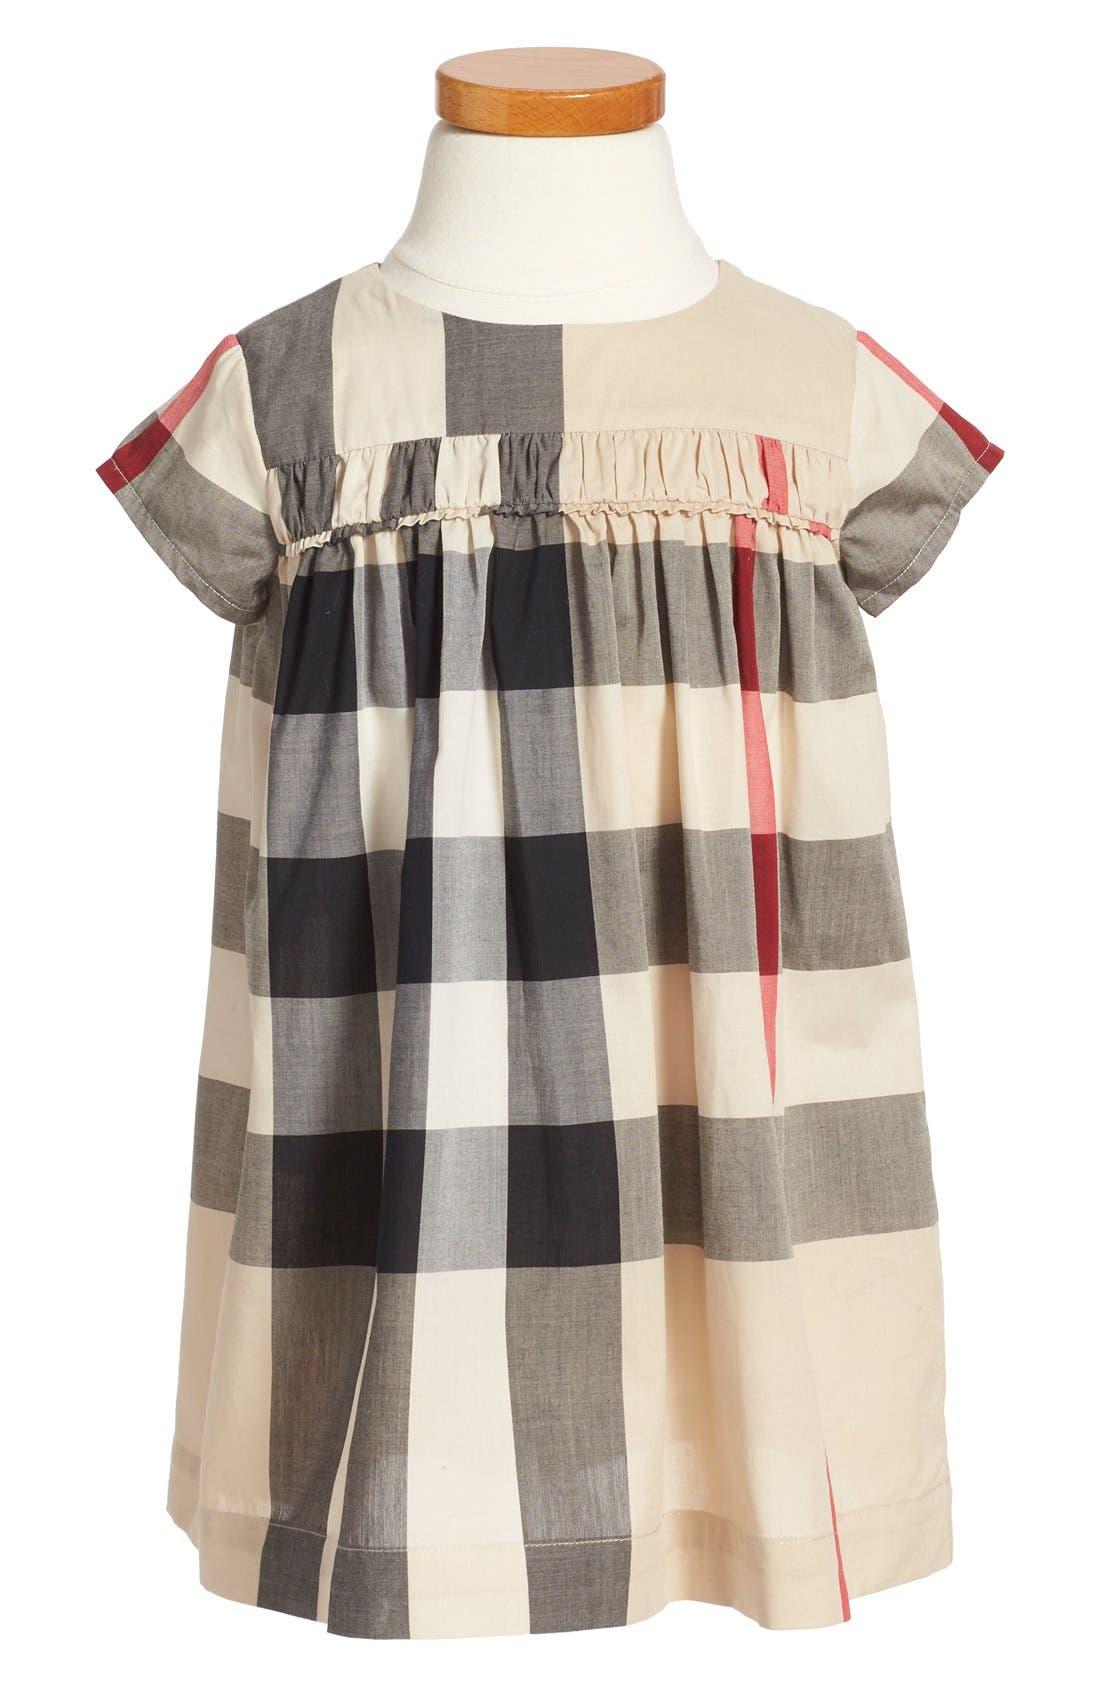 Main Image - Burberry 'Ariadne' Check Woven Dress (Toddler Girls)